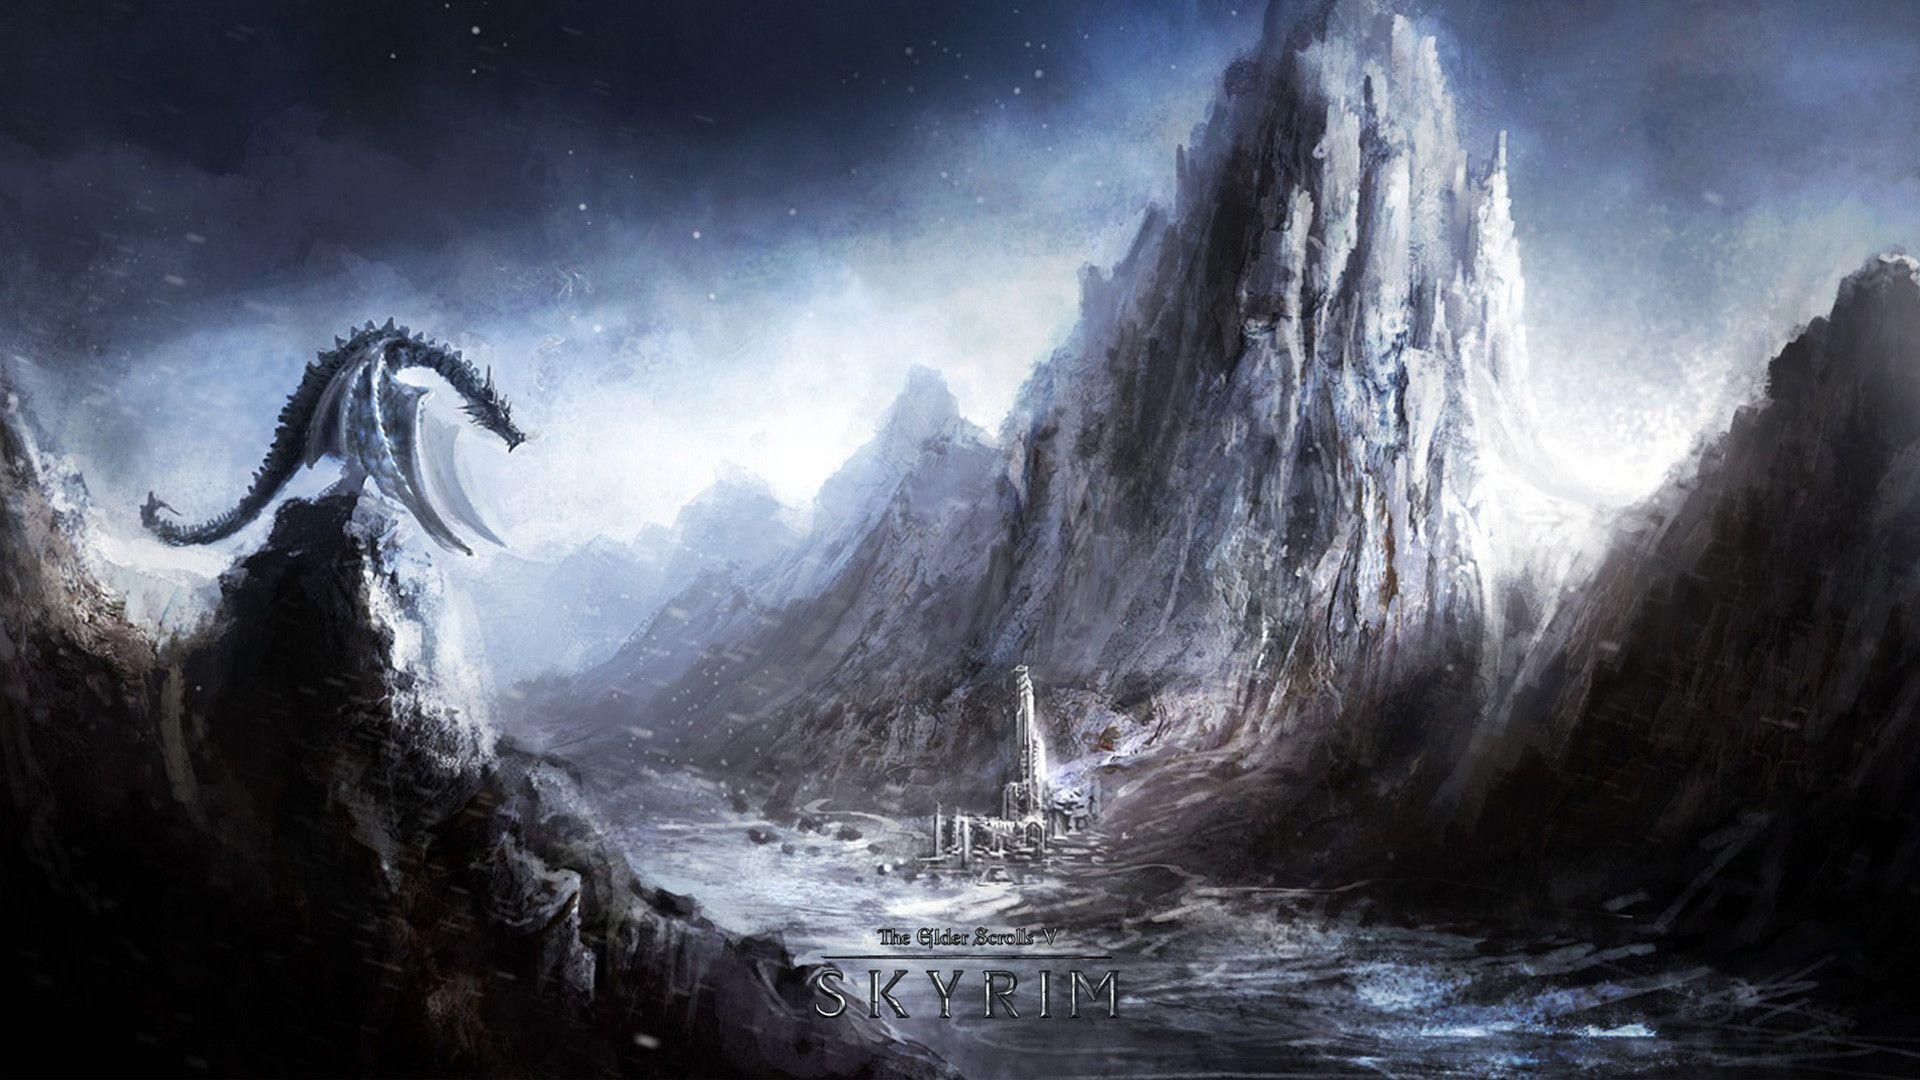 cool skyrim backgrounds, skyrim wallpaper hd 1080p